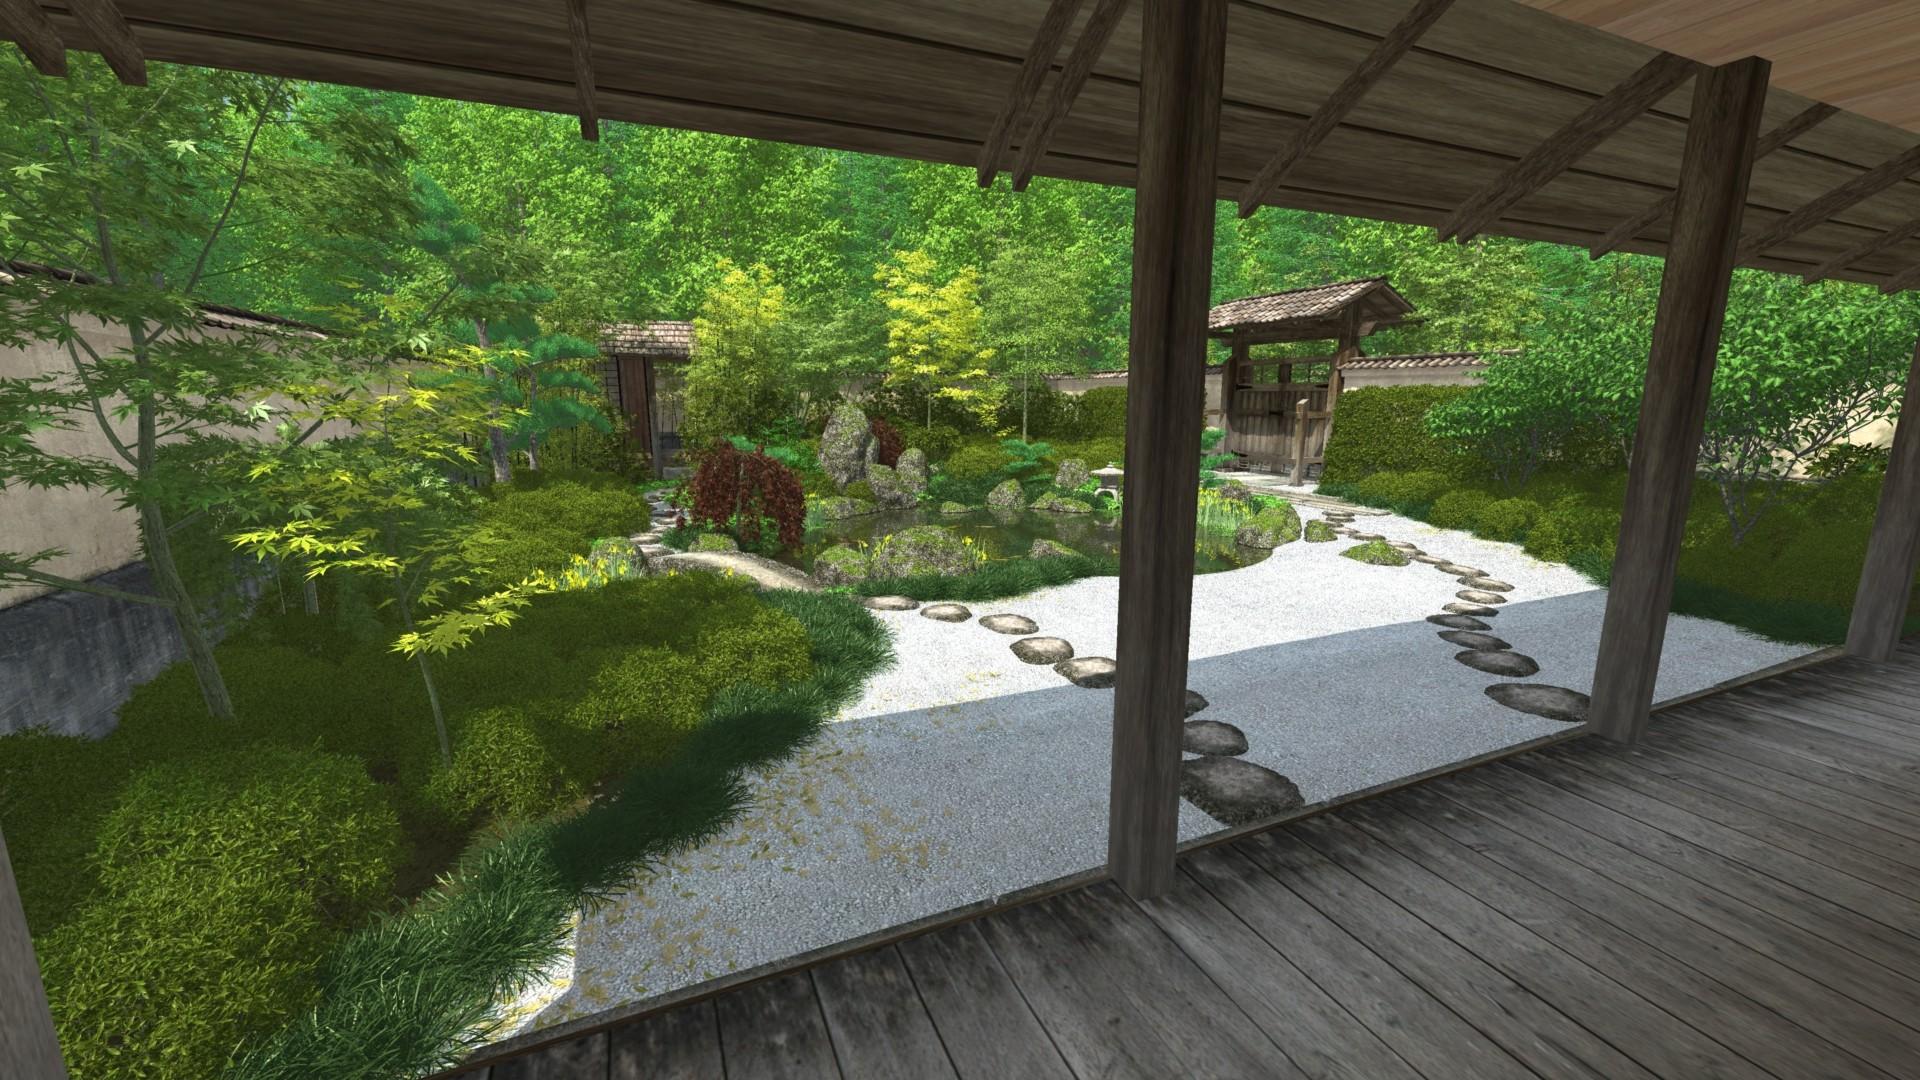 Man Caves Japanese Tea Garden : Image gallery japanese tea garden wallpaper